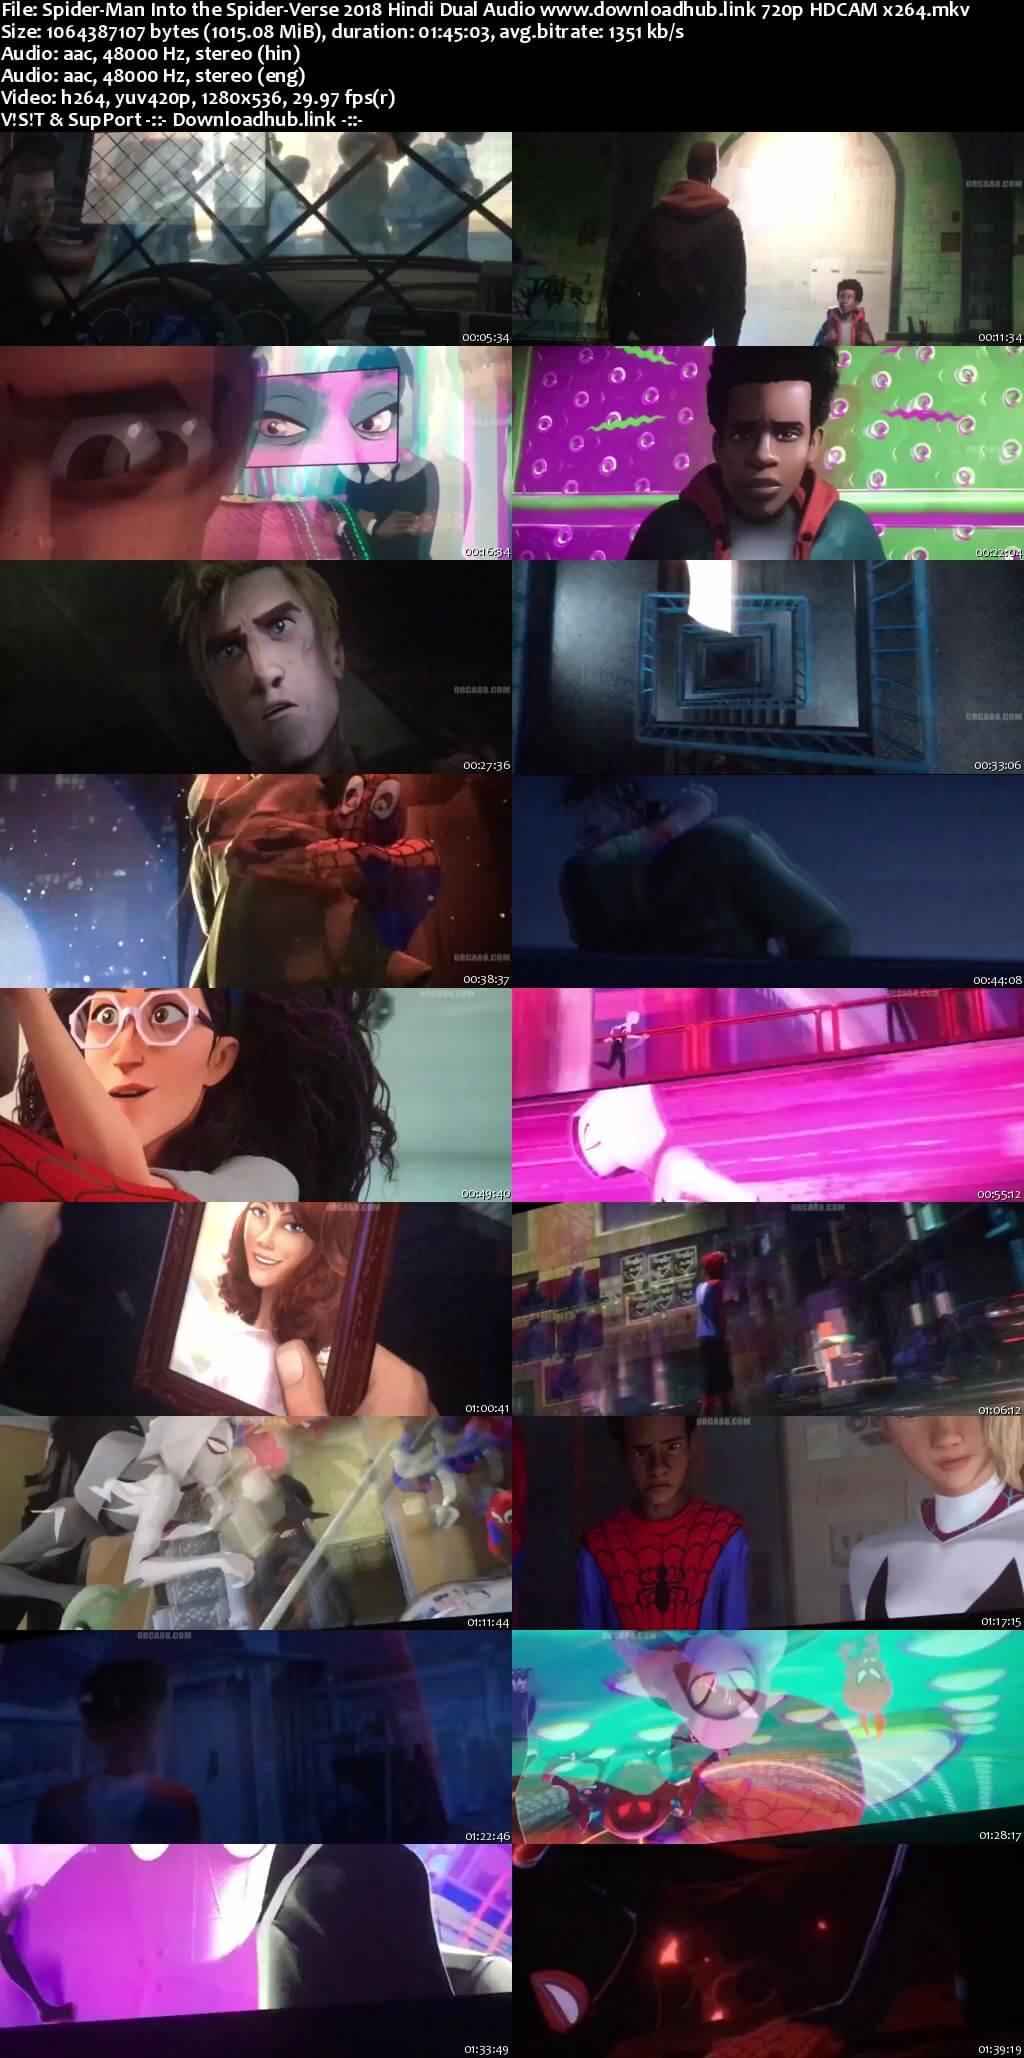 Spider-Man Into the Spider-Verse 2018 Hindi Dual Audio 720p HDCAM x264